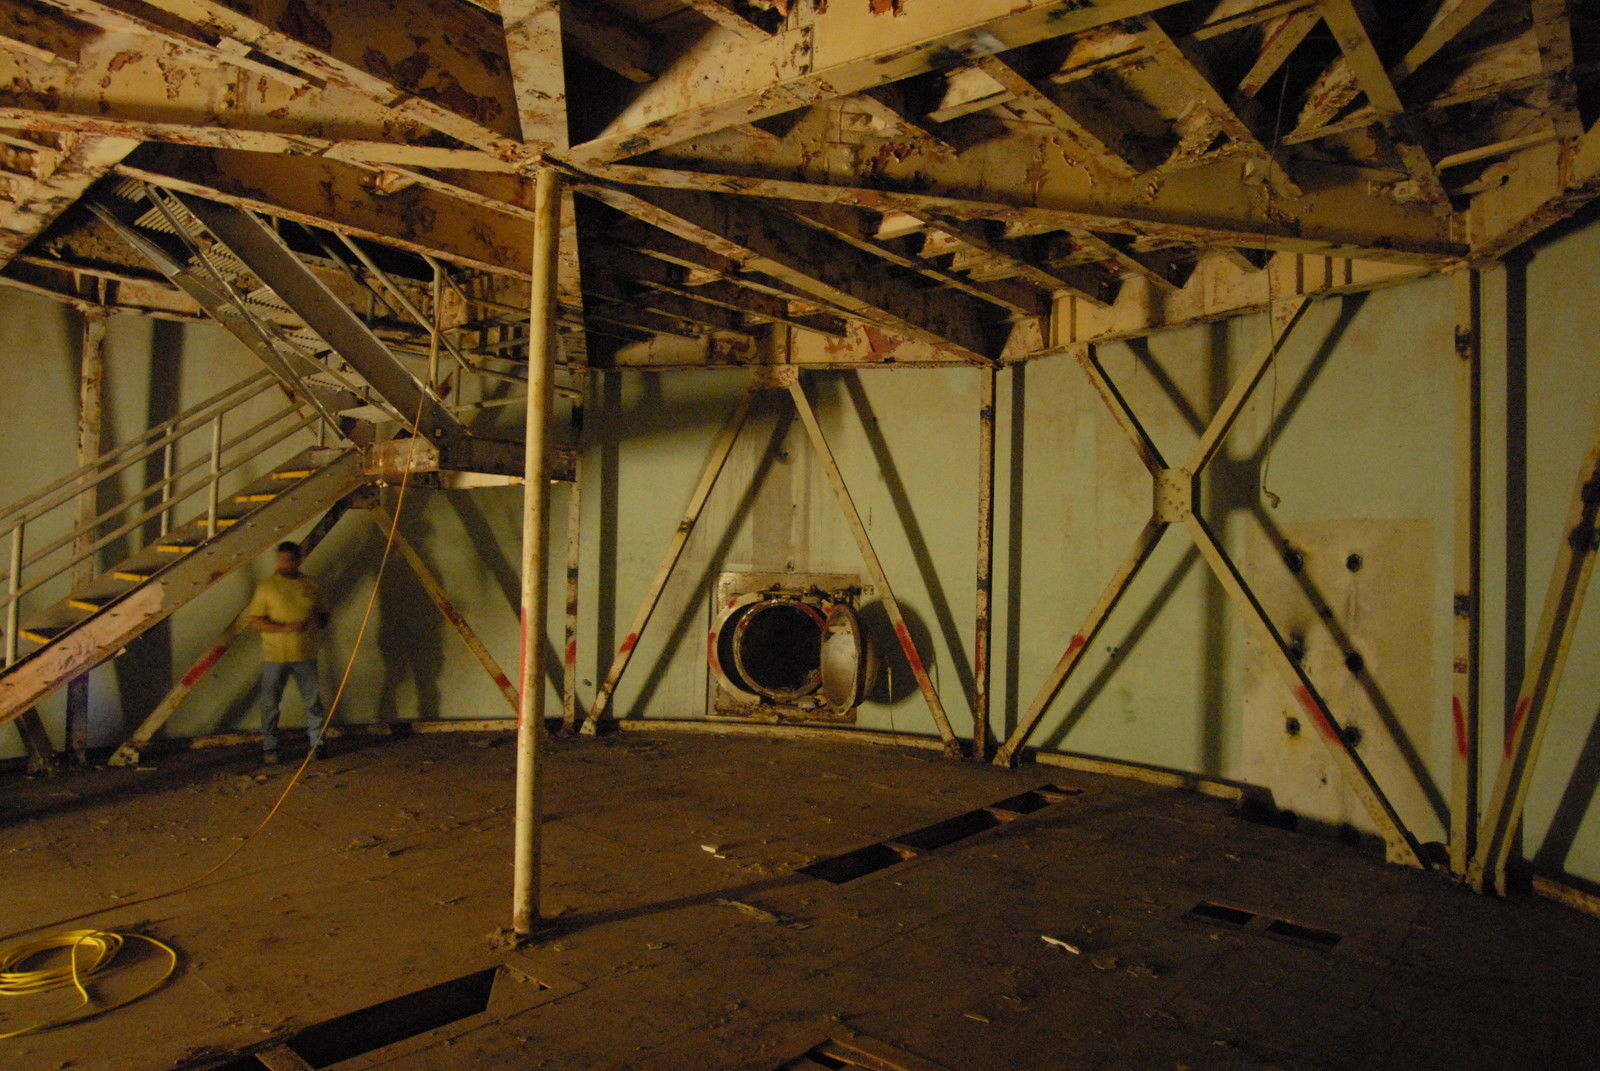 Ebay Bunker for Sale